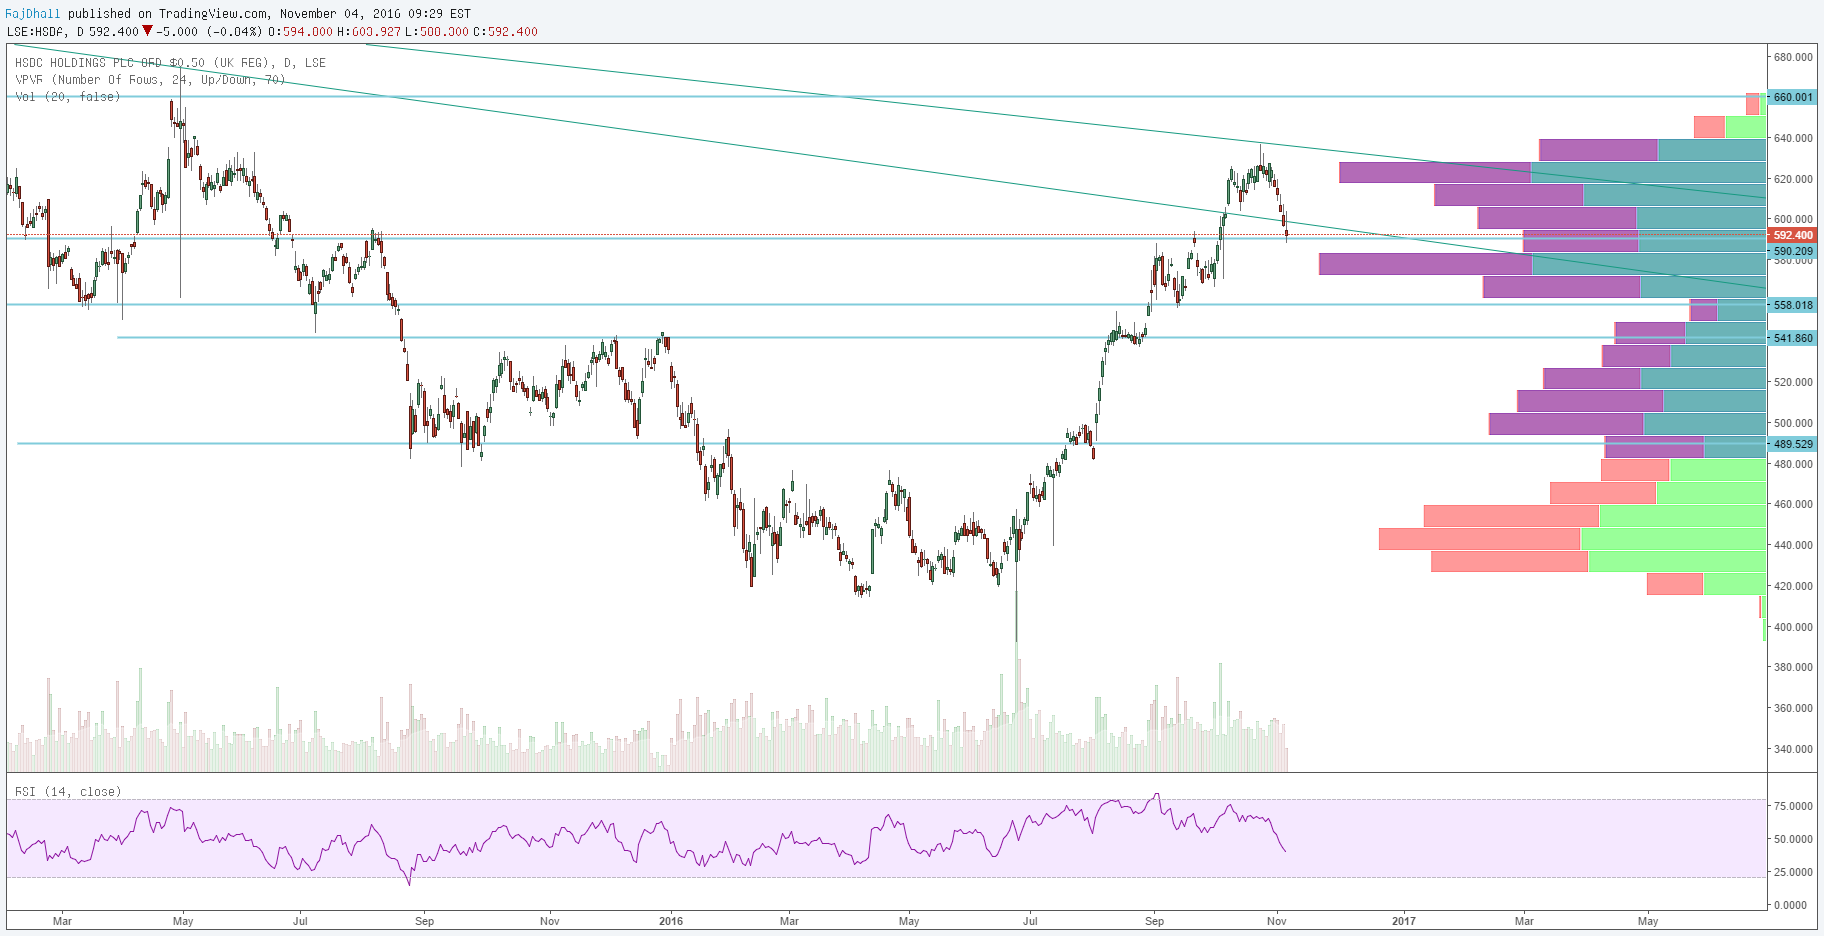 HSBC (HSBA LN) earnings Monday for LSE:HSBA by RajDhall — TradingView UK